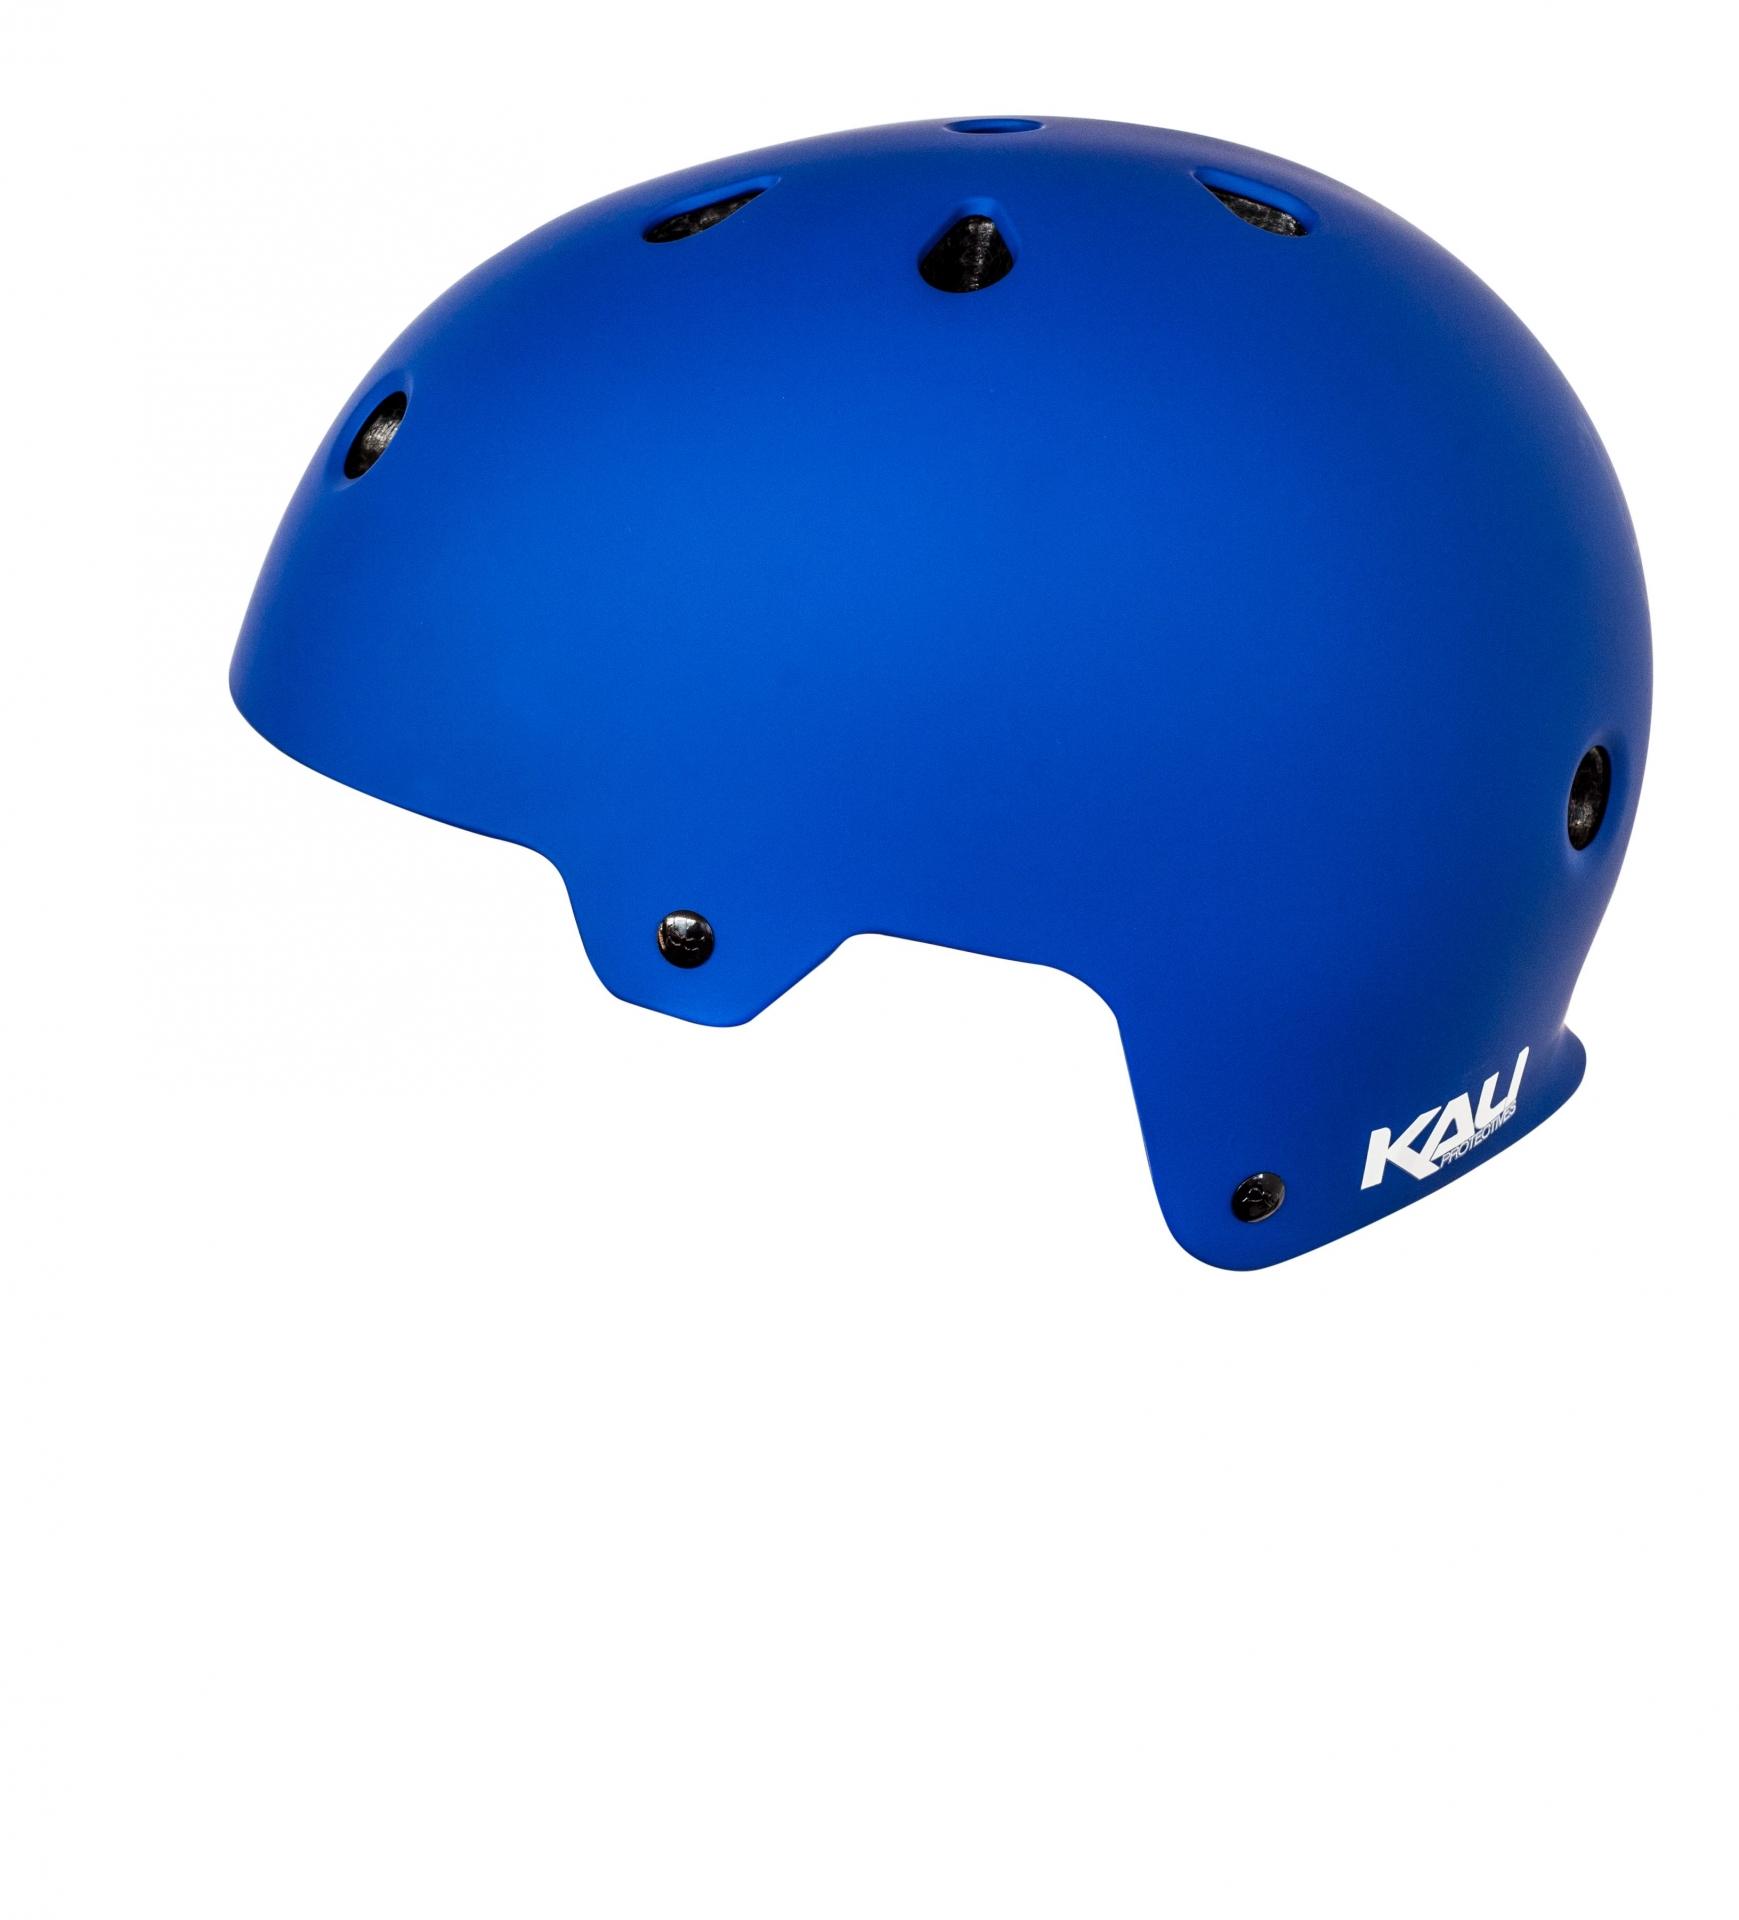 Casque Kali Protectives Maha Kali Solid Bleu - S (48-54)